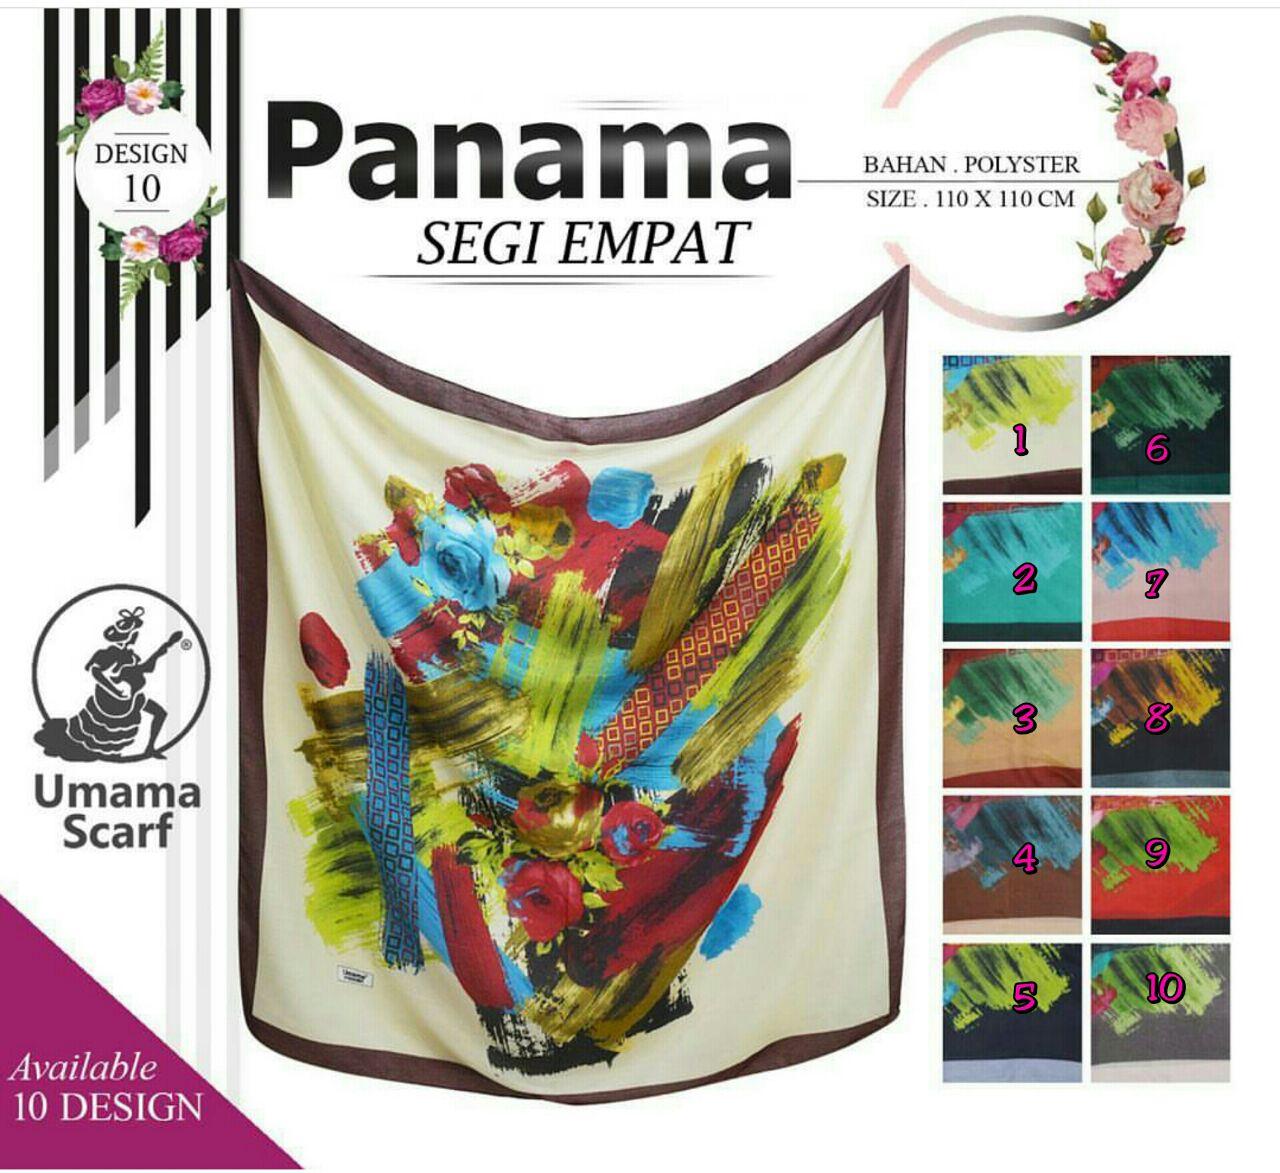 Segiempat Panama 19 22 30 320 by Umama Design 10 SG Jilbab.jpg